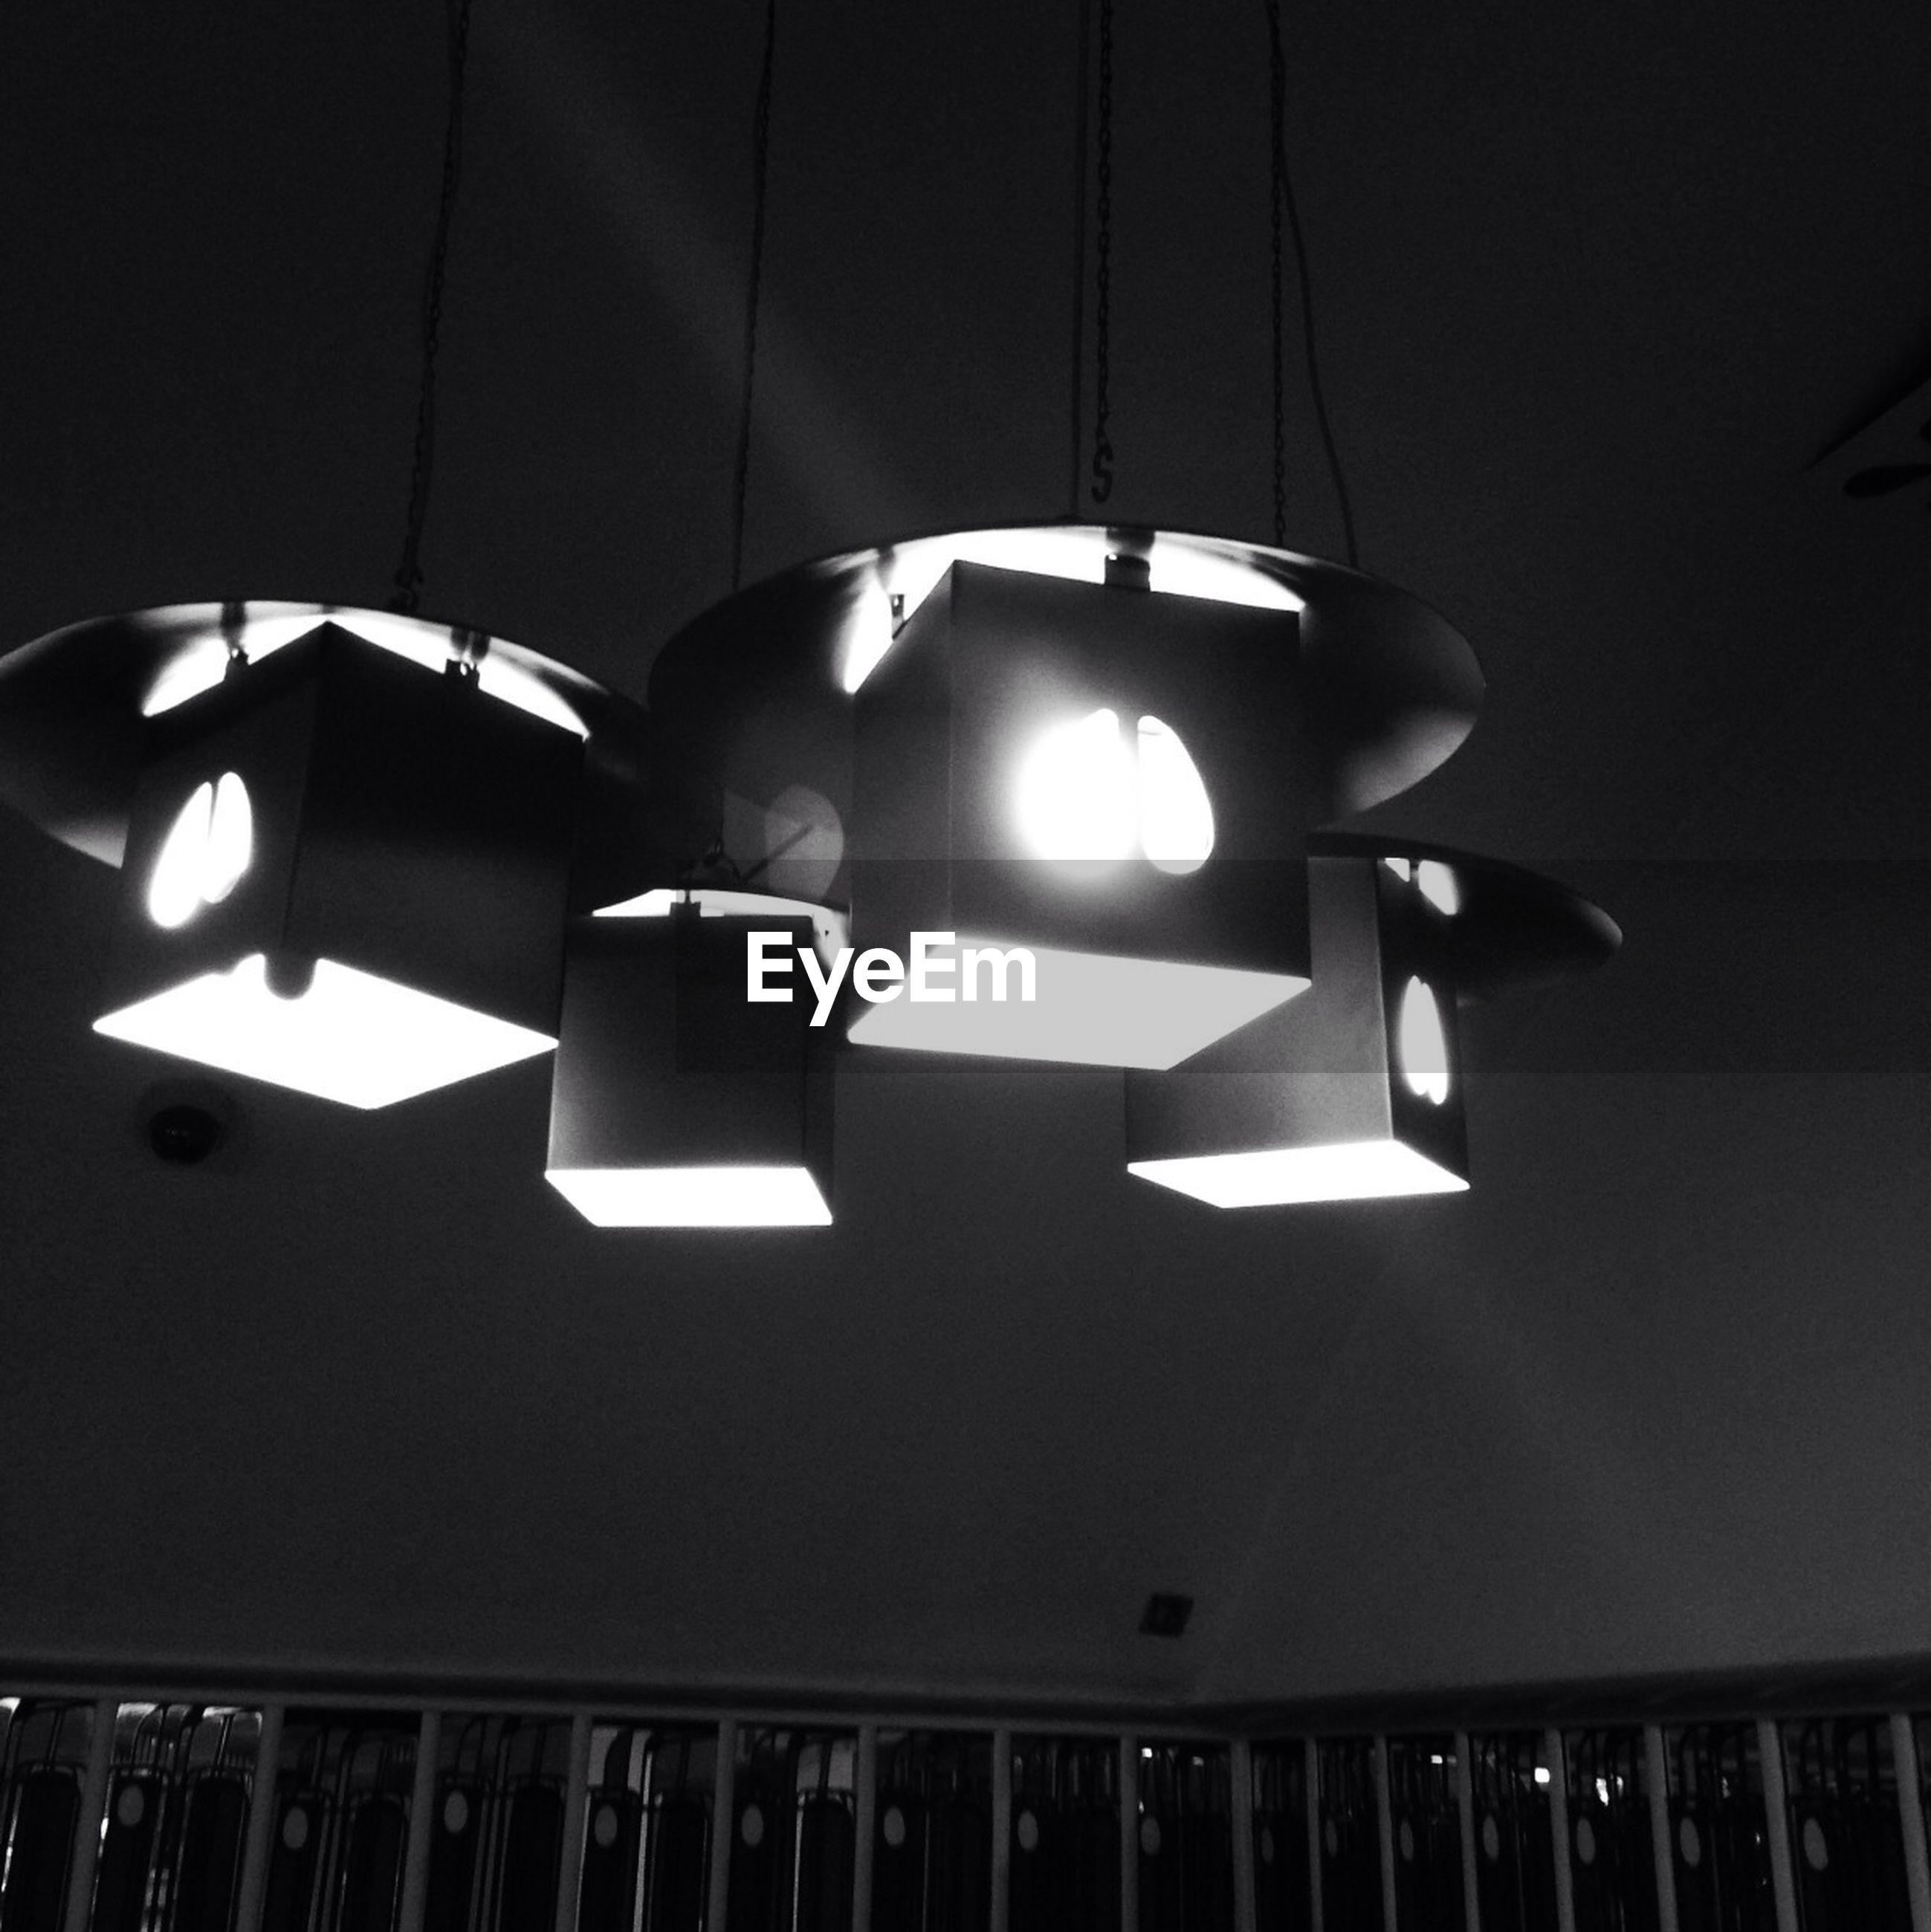 Lighting equipment at nightclub